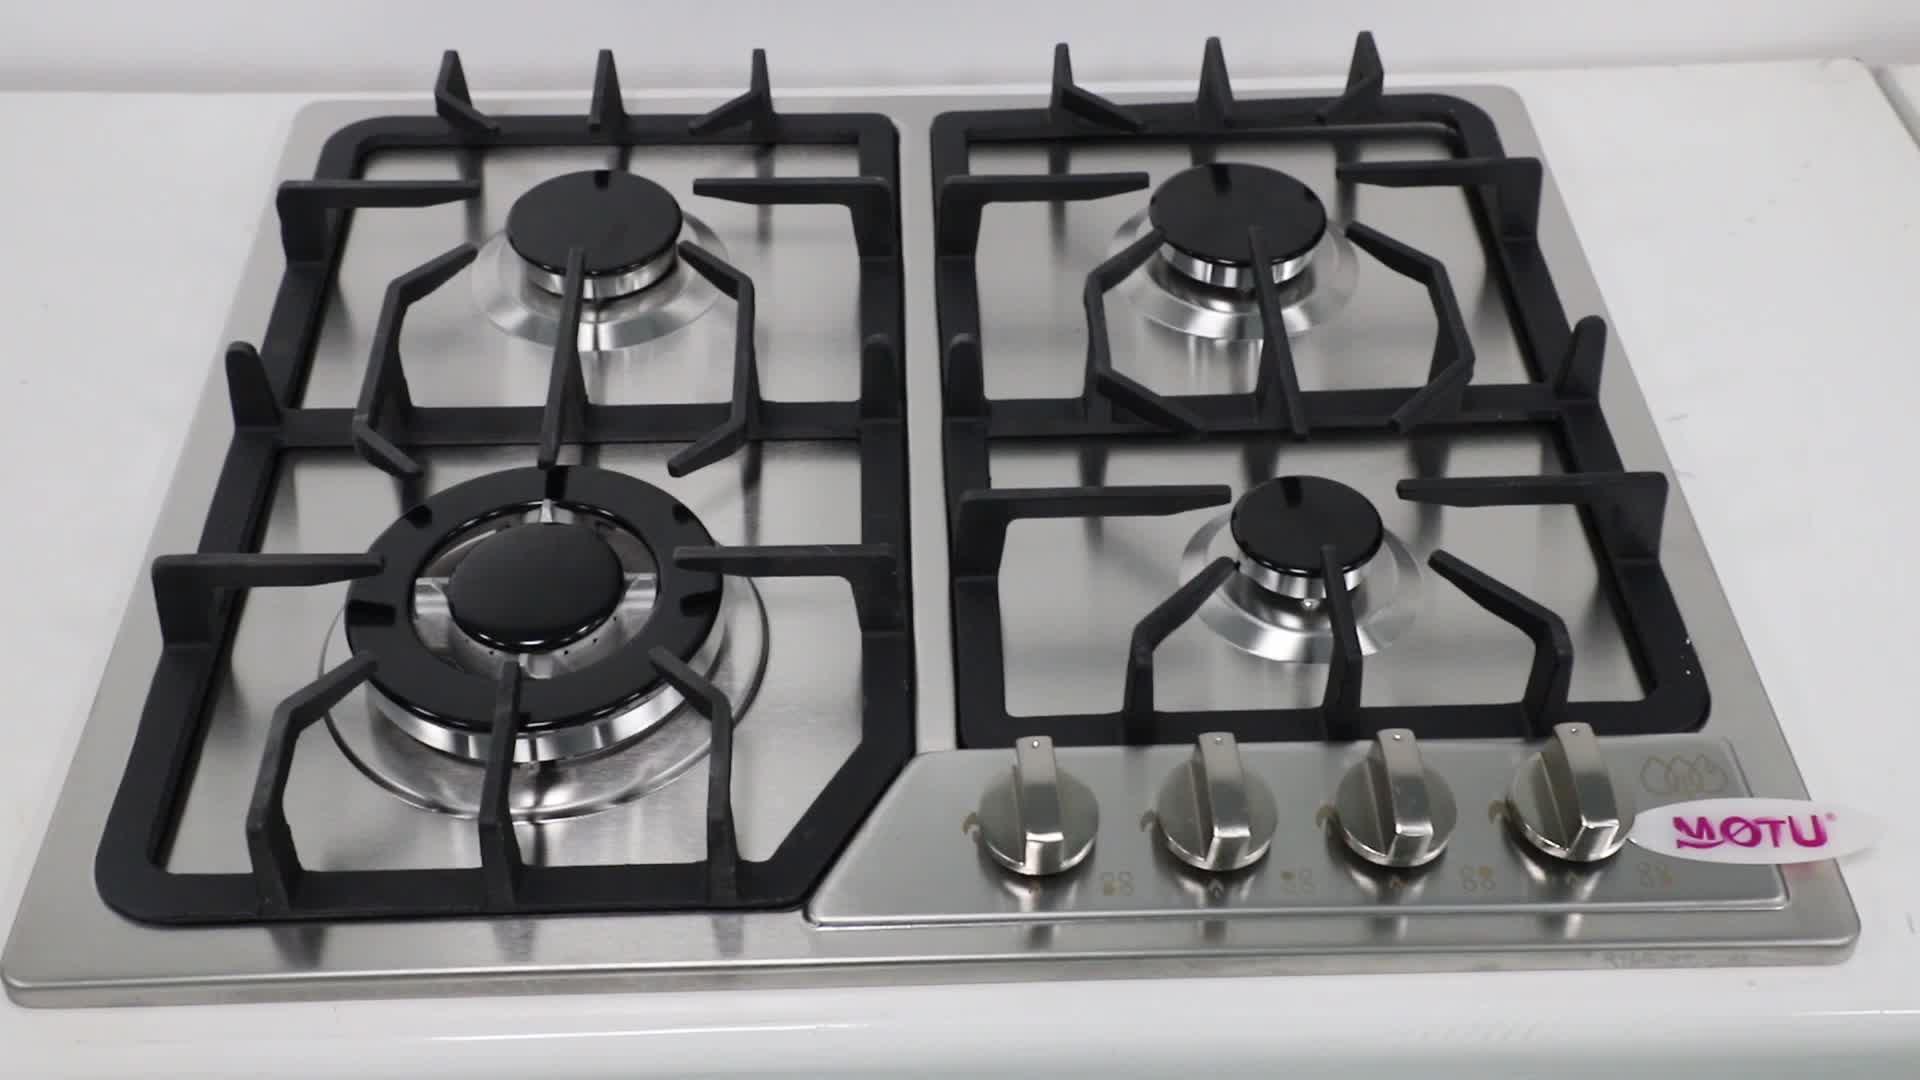 Familie gebruikt bulit gaskookplaten 4 5 branders tafel top gasfornuis